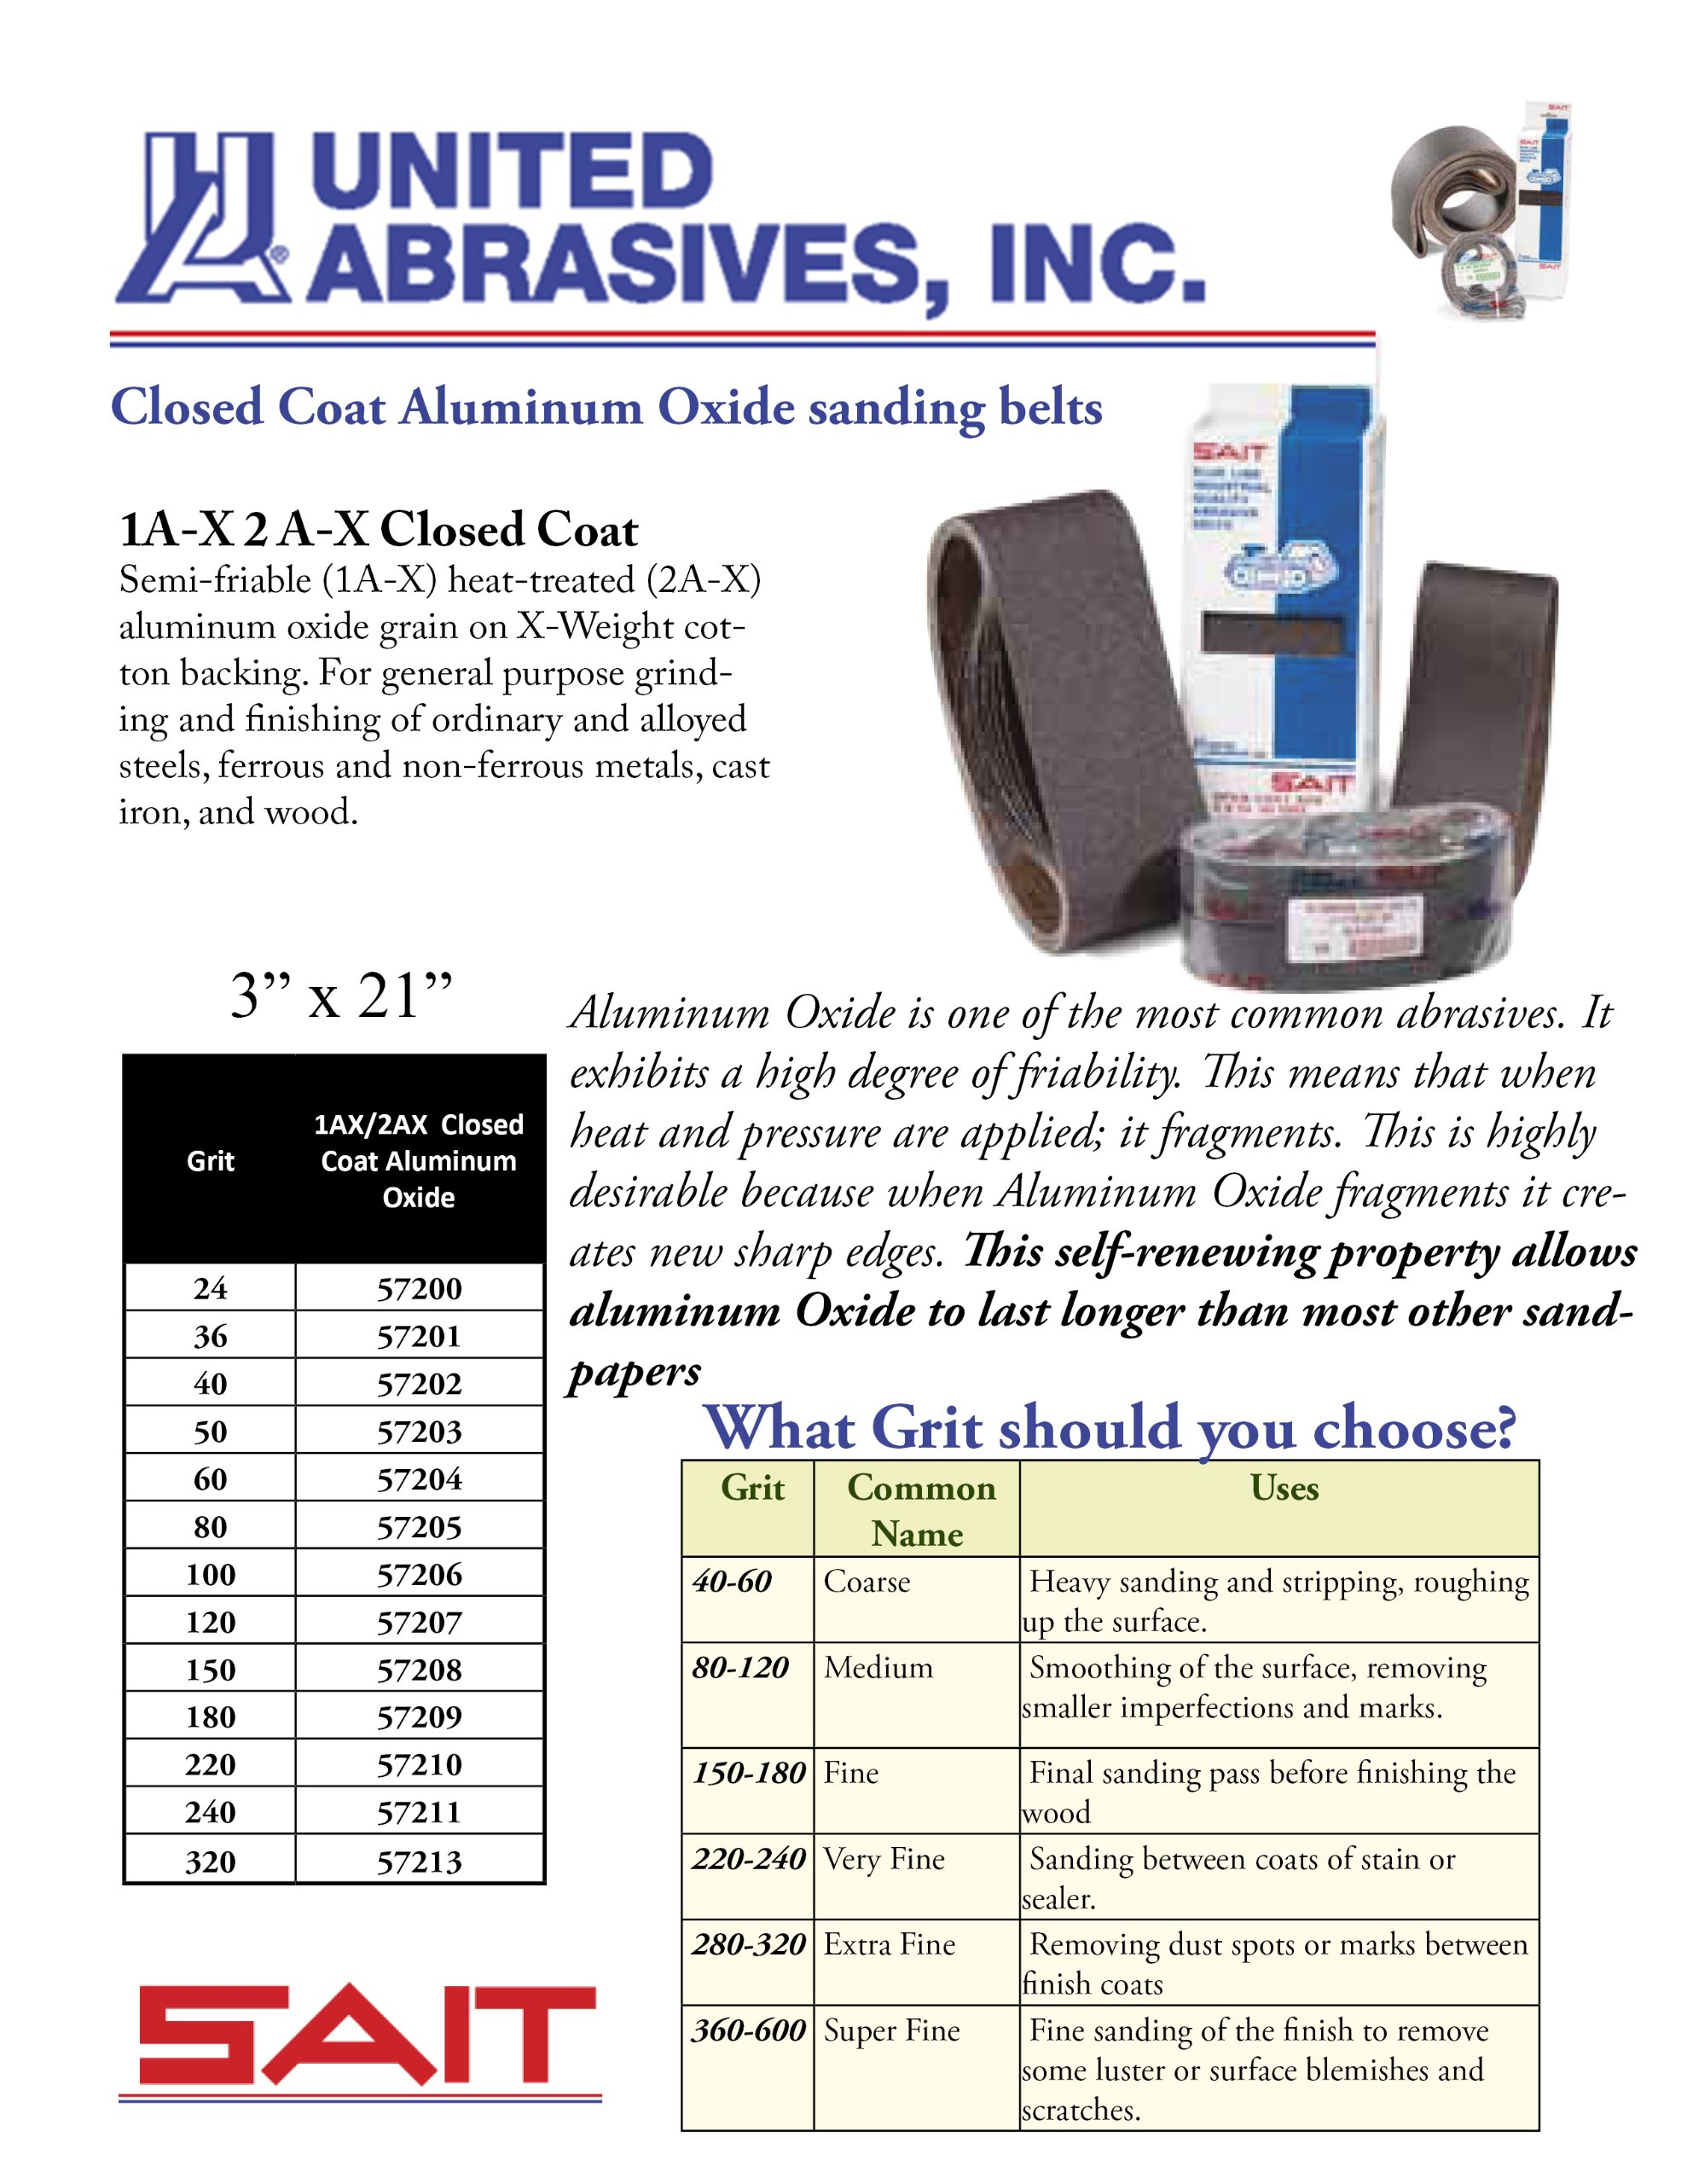 United Abrasives-SAIT 57210 1AX/2AX Closed Coat Aluminum Oxide 3-Inch x 21-Inch 220 Grit Blue Line Sanding Belt, 10-Pack